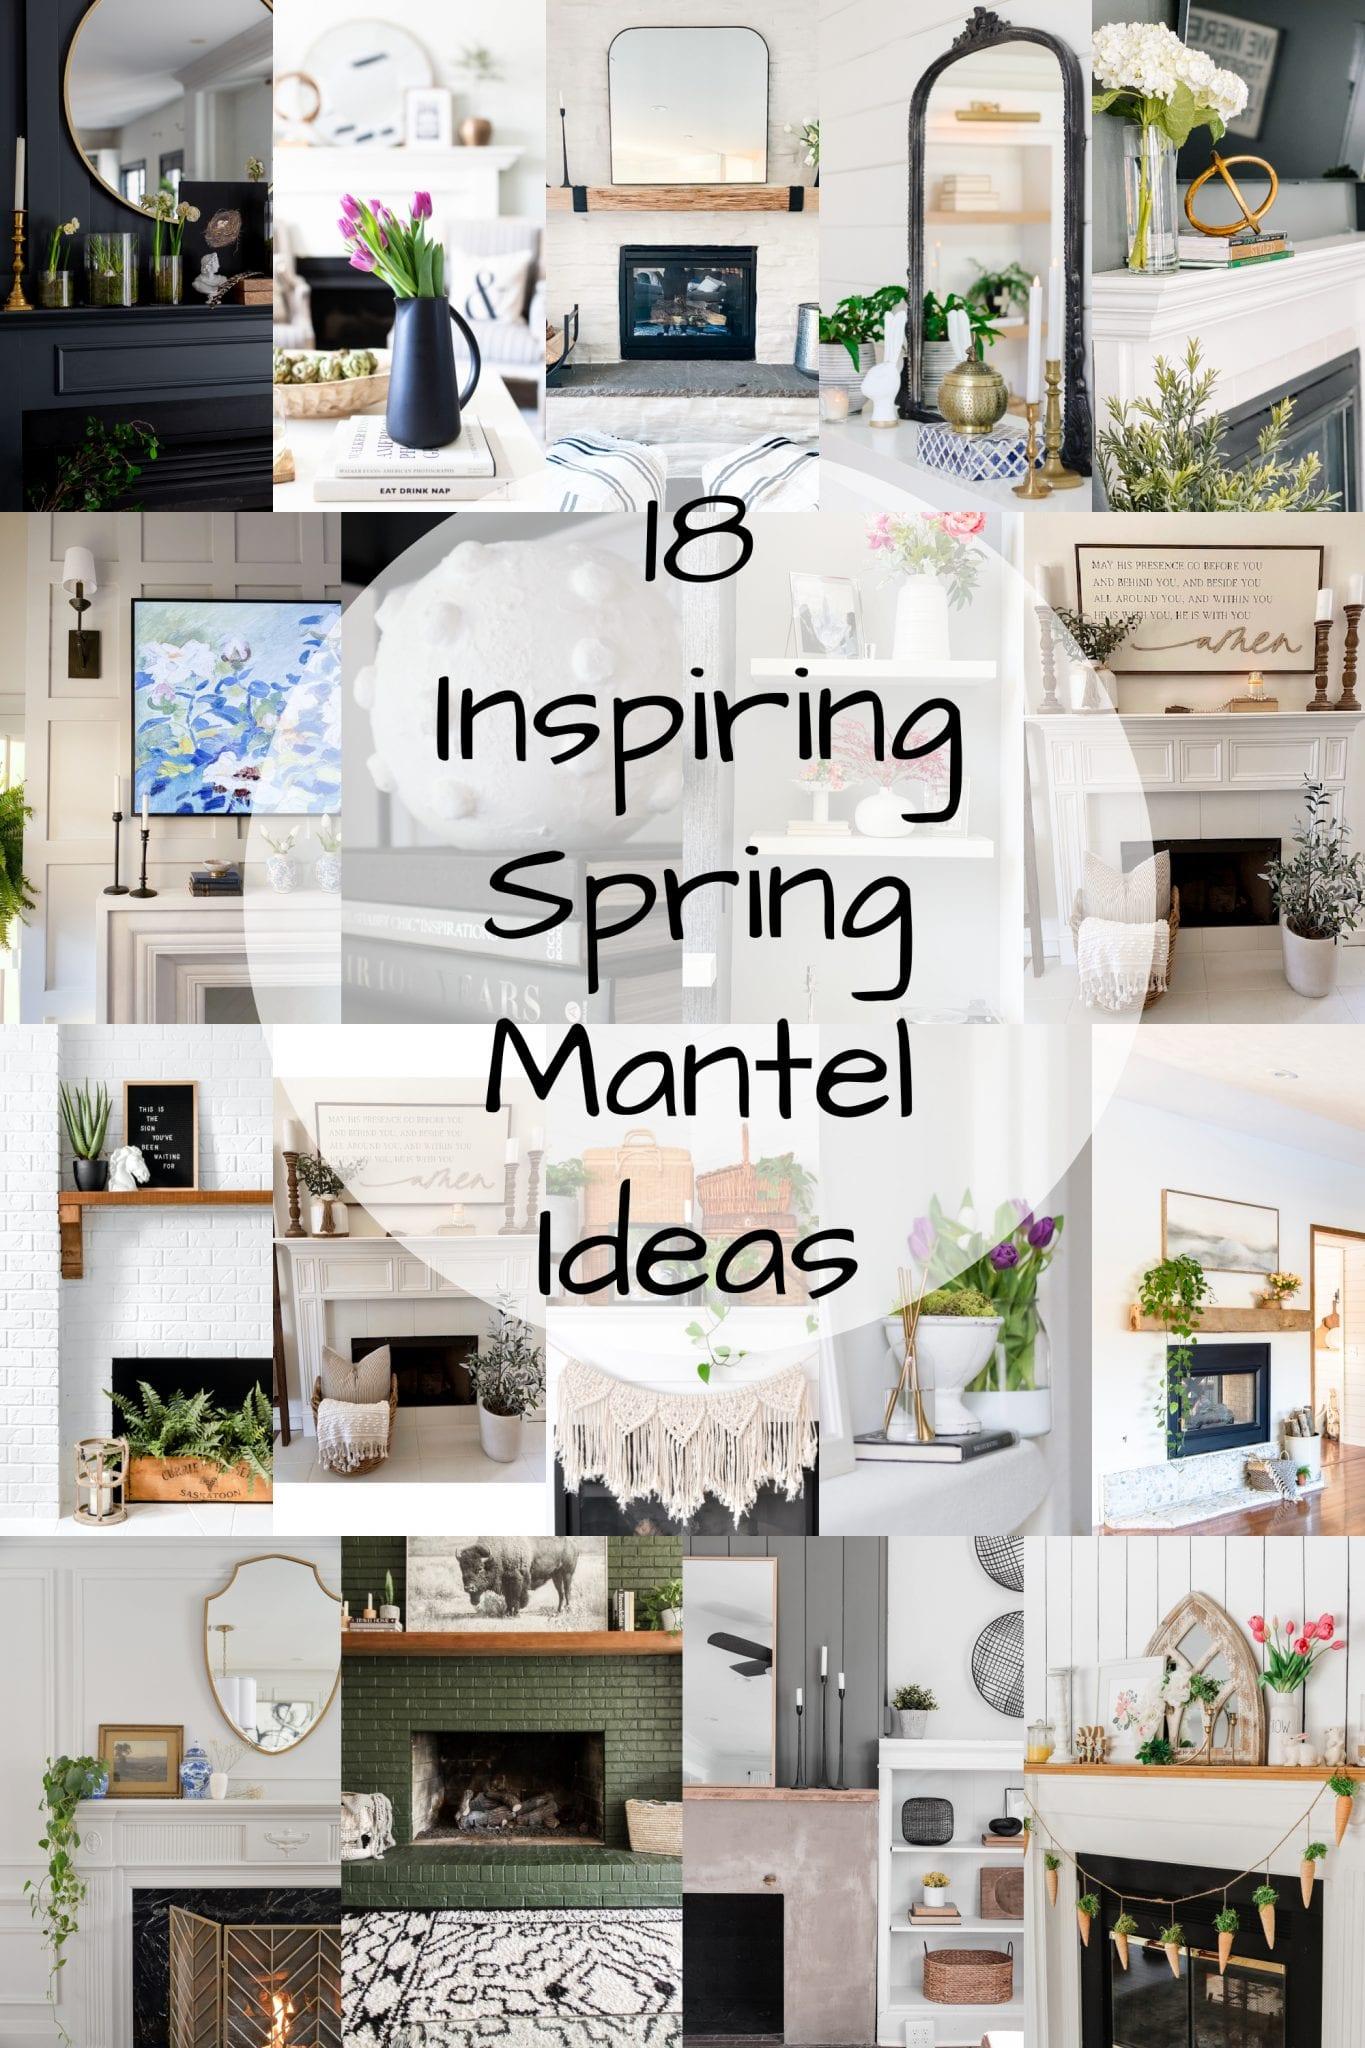 spring mantel ideas via @modernglamhome